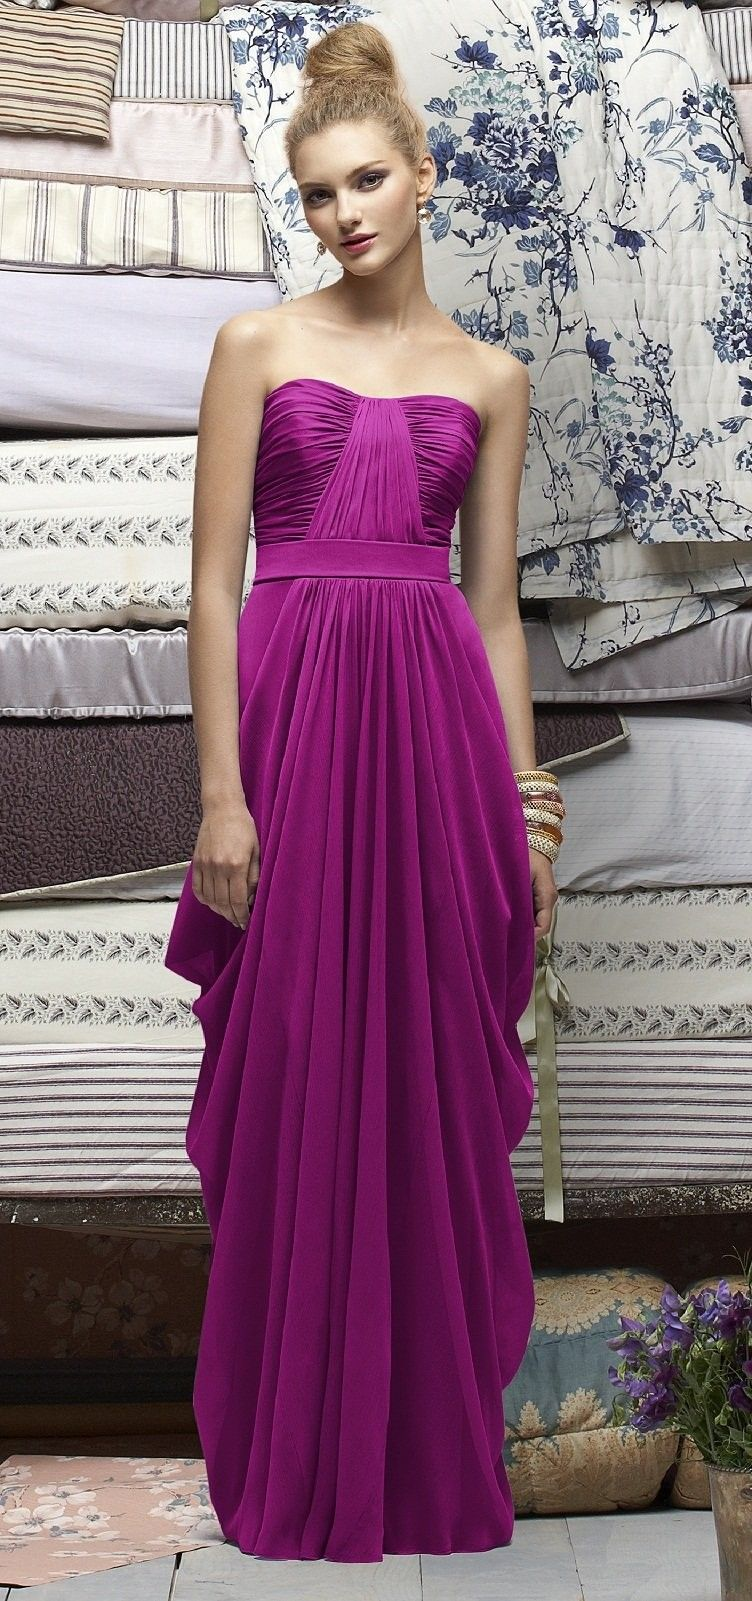 Lela Rose STYLE LR163 BRIDESMAID DRESS | Wedding Ideas | Pinterest ...